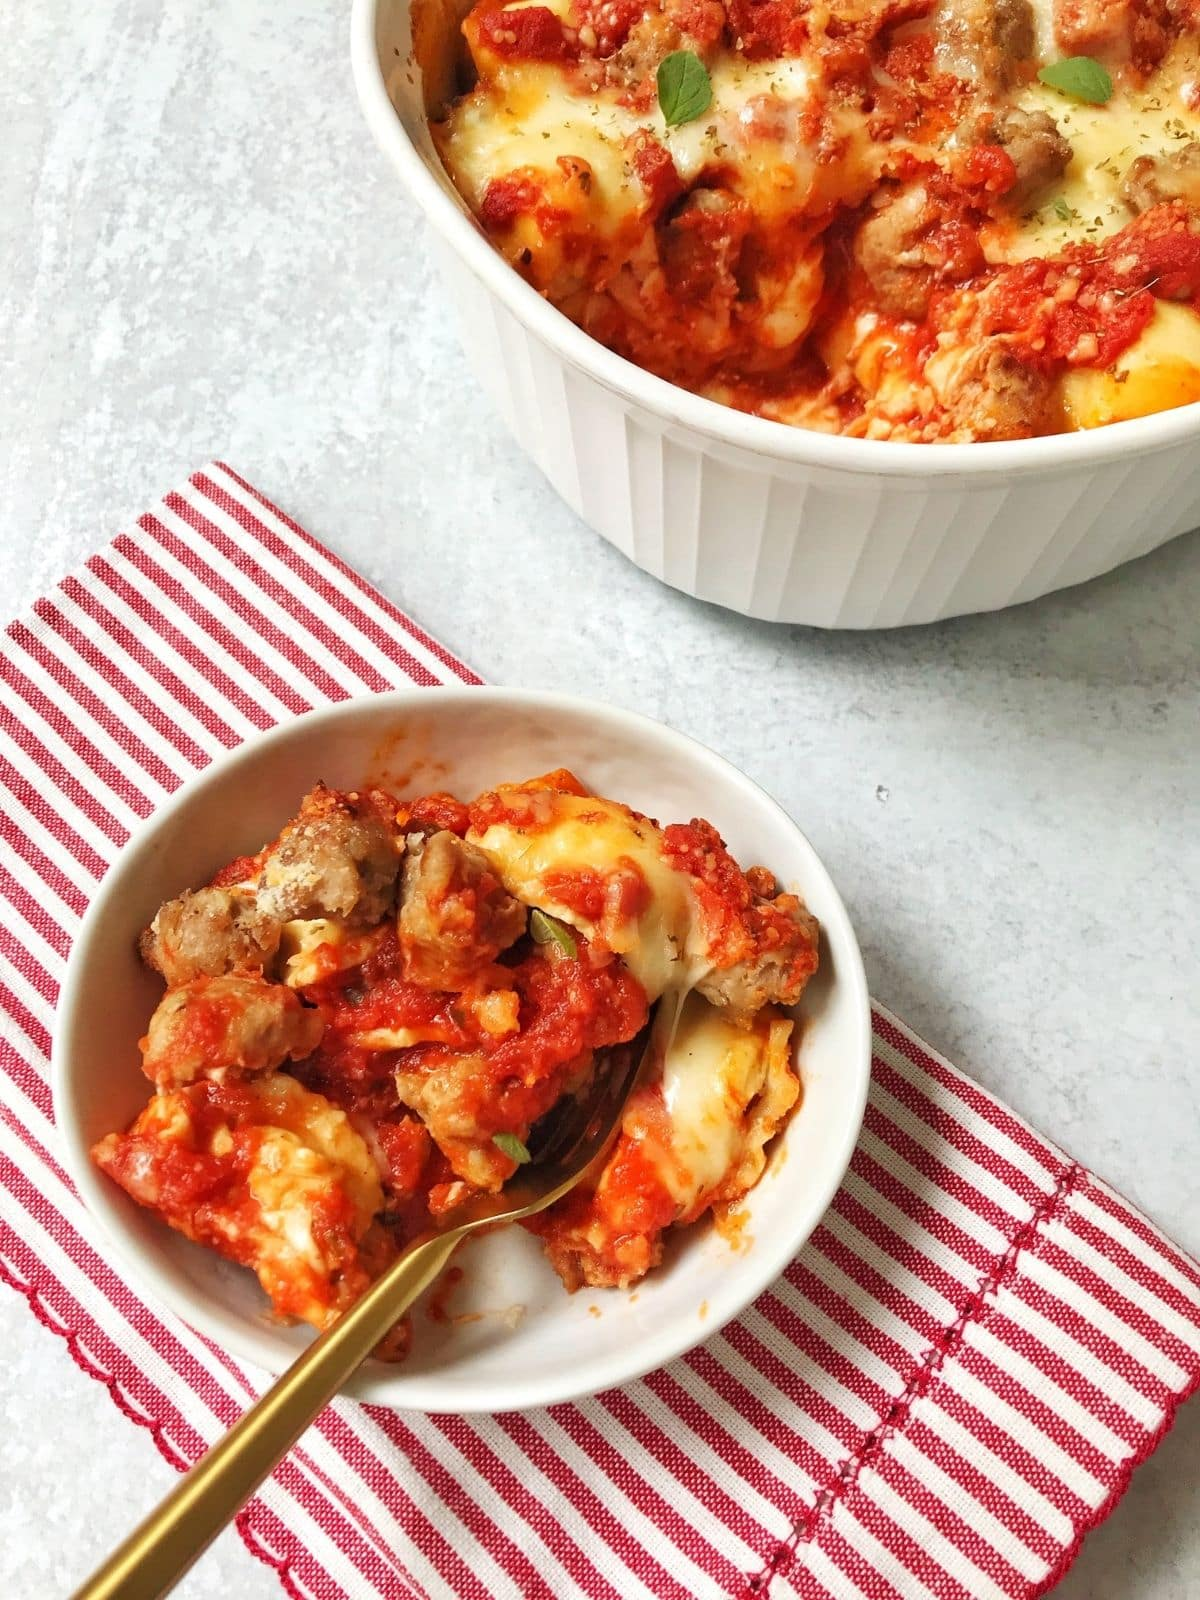 dish of ravioli and sausage bake